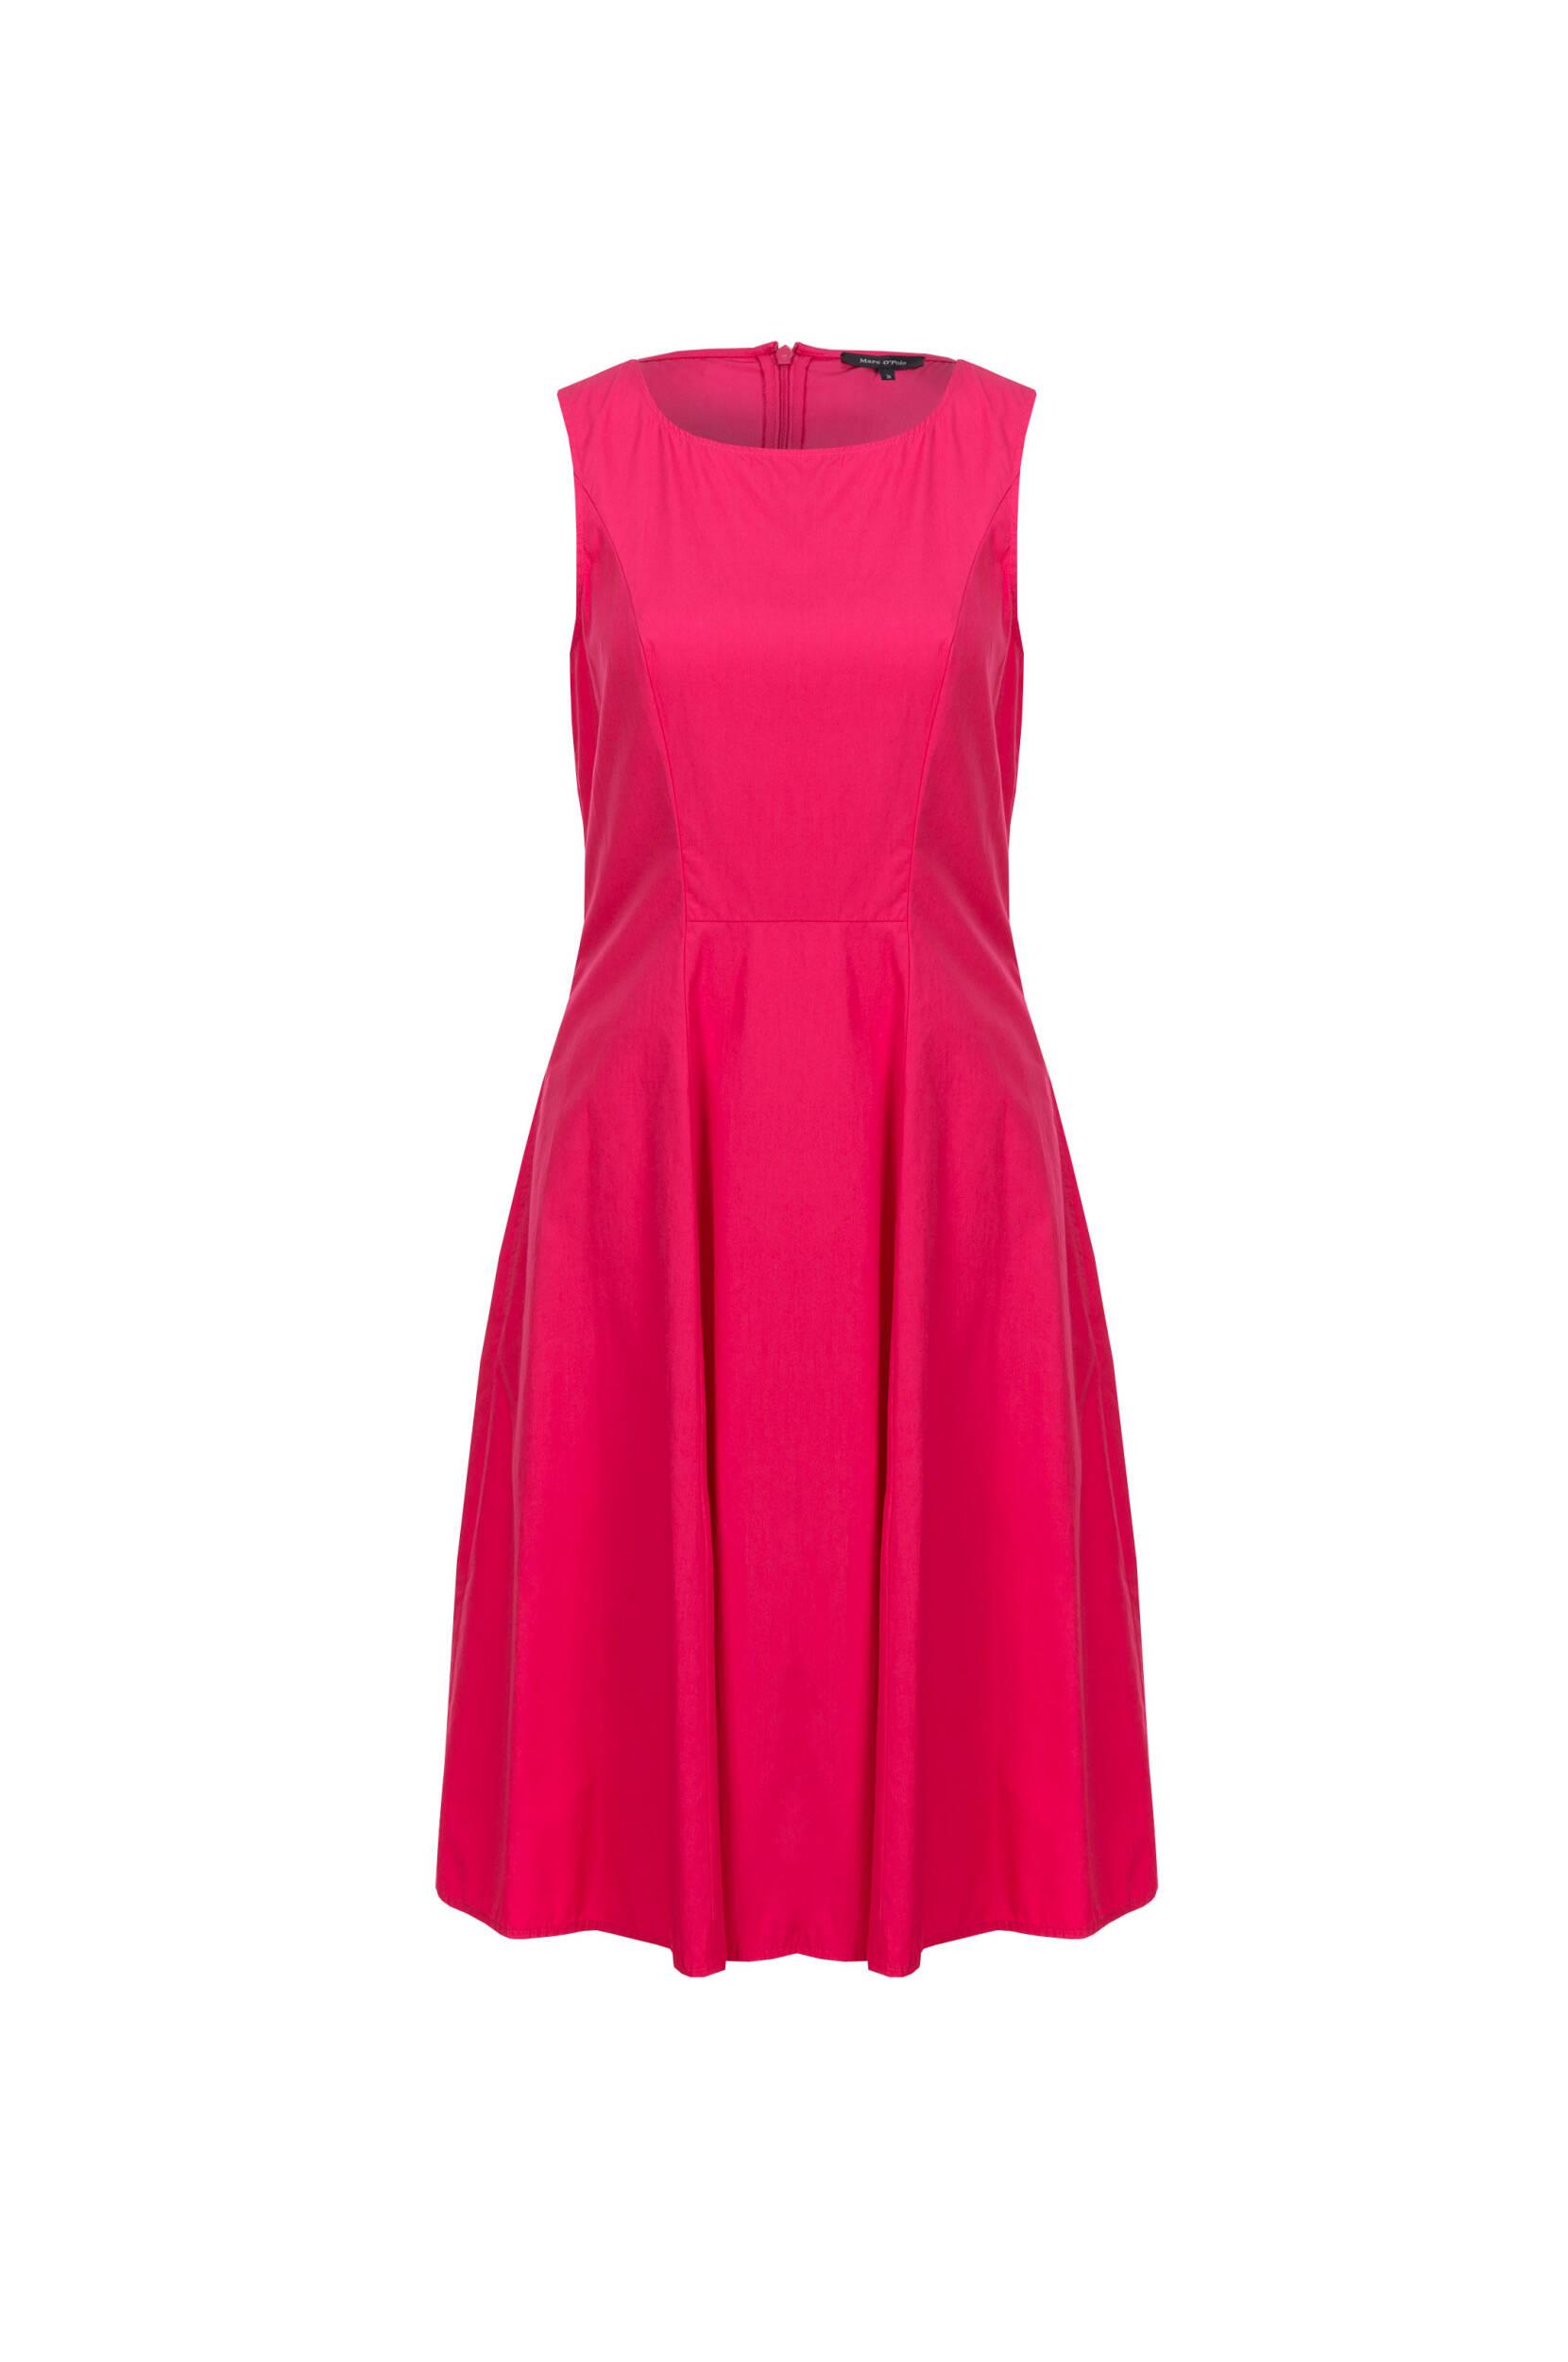 marco polo pink dress stylische kleider f r jeden tag. Black Bedroom Furniture Sets. Home Design Ideas